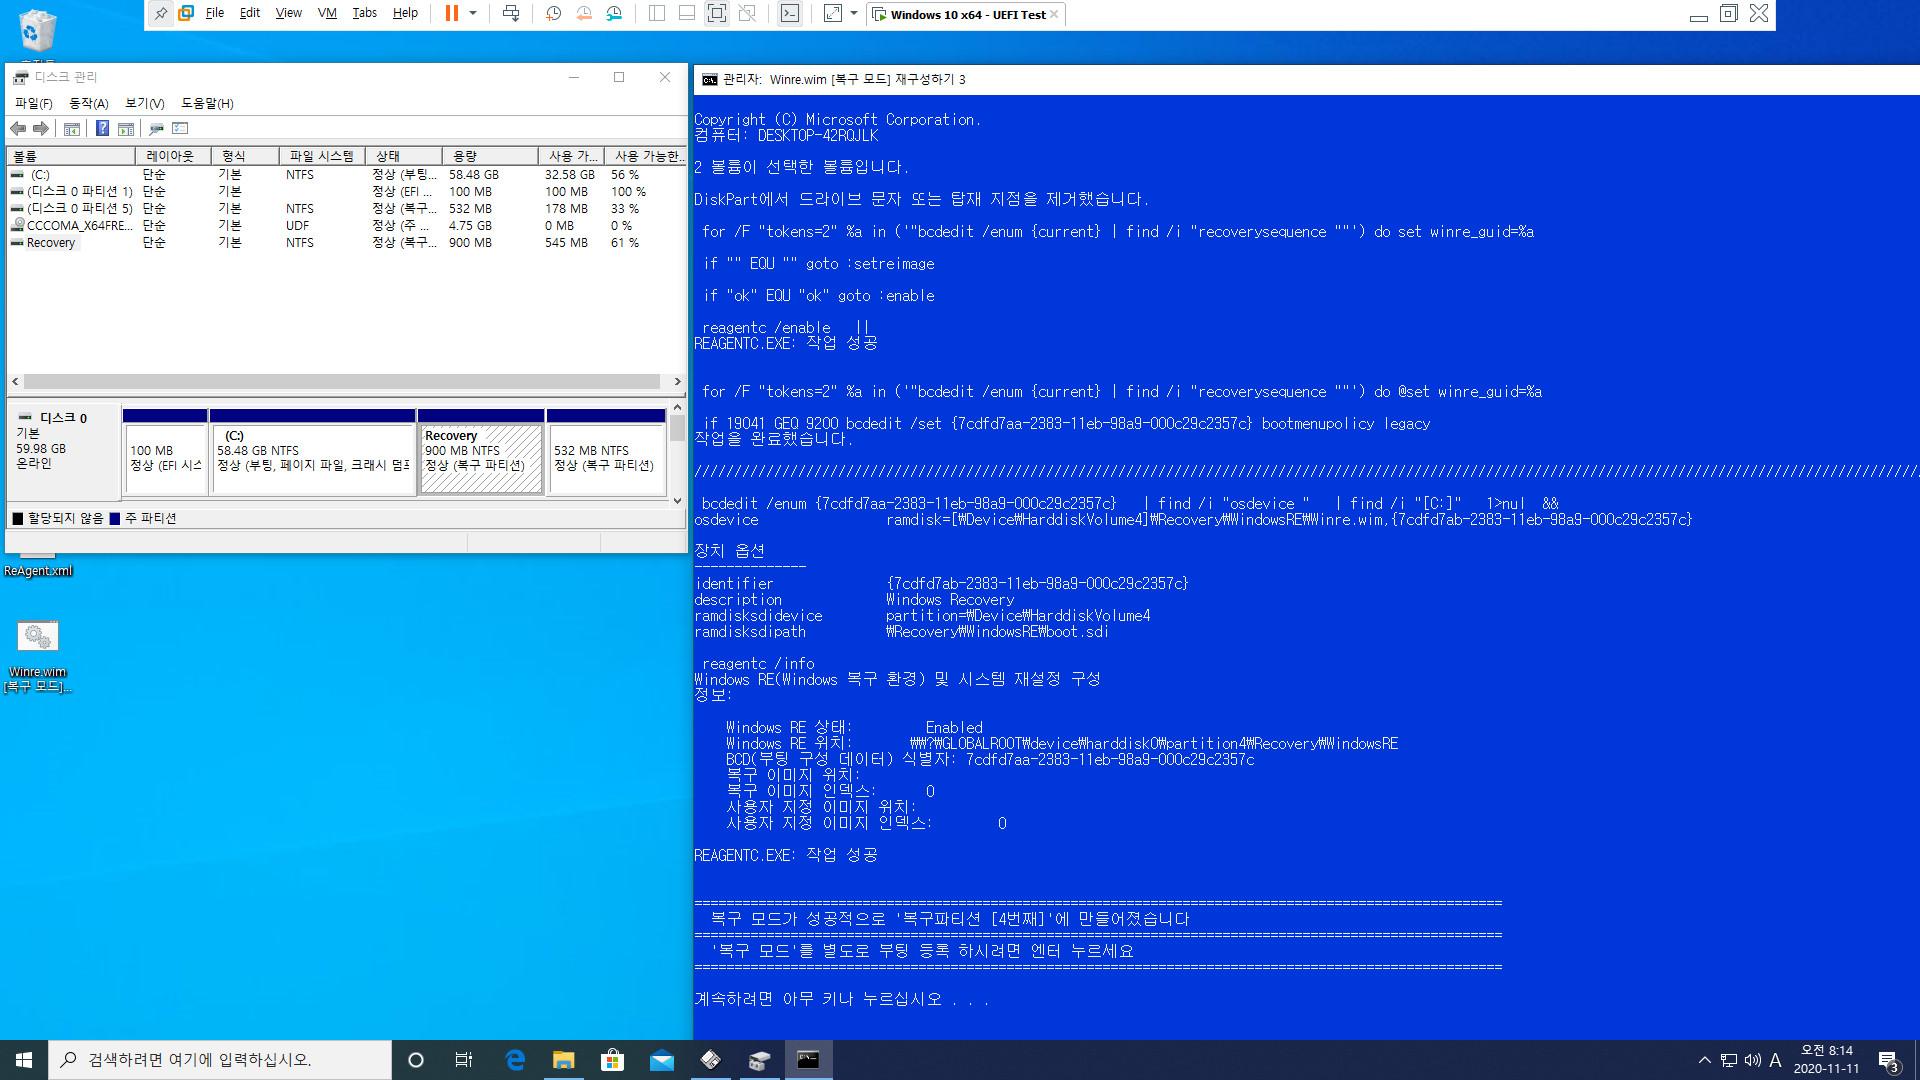 Winre.wim [복구 모드] 재구성하기 3 - 복구파티션 포함 [2020-11-11].bat 테스트 2020-11-11_081500.jpg